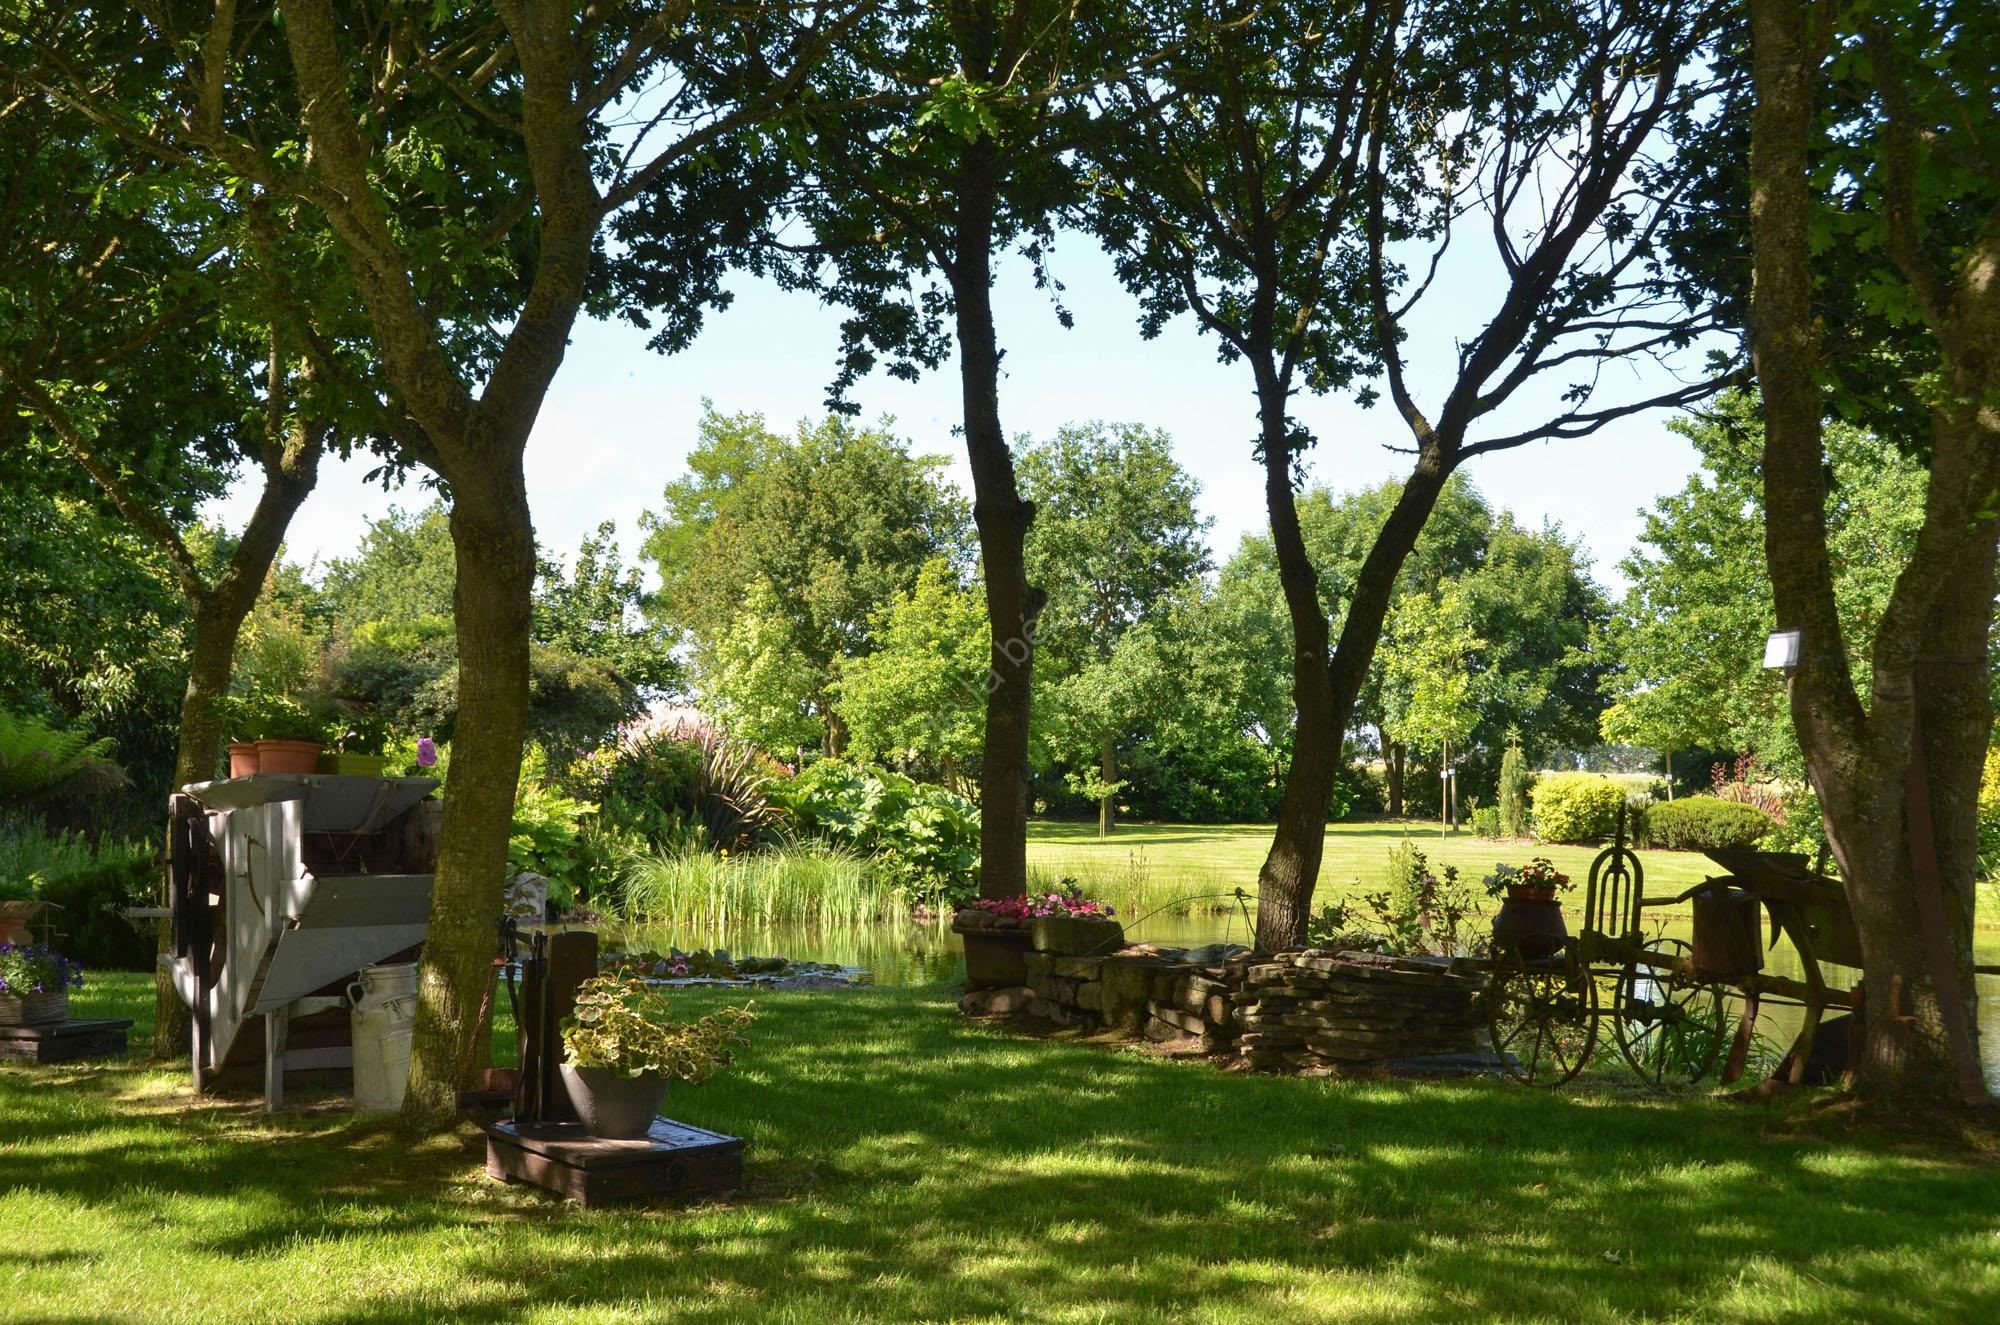 Bienvenue dans mon jardin 13 g te de la b zardais for Bienvenue dans mon jardin